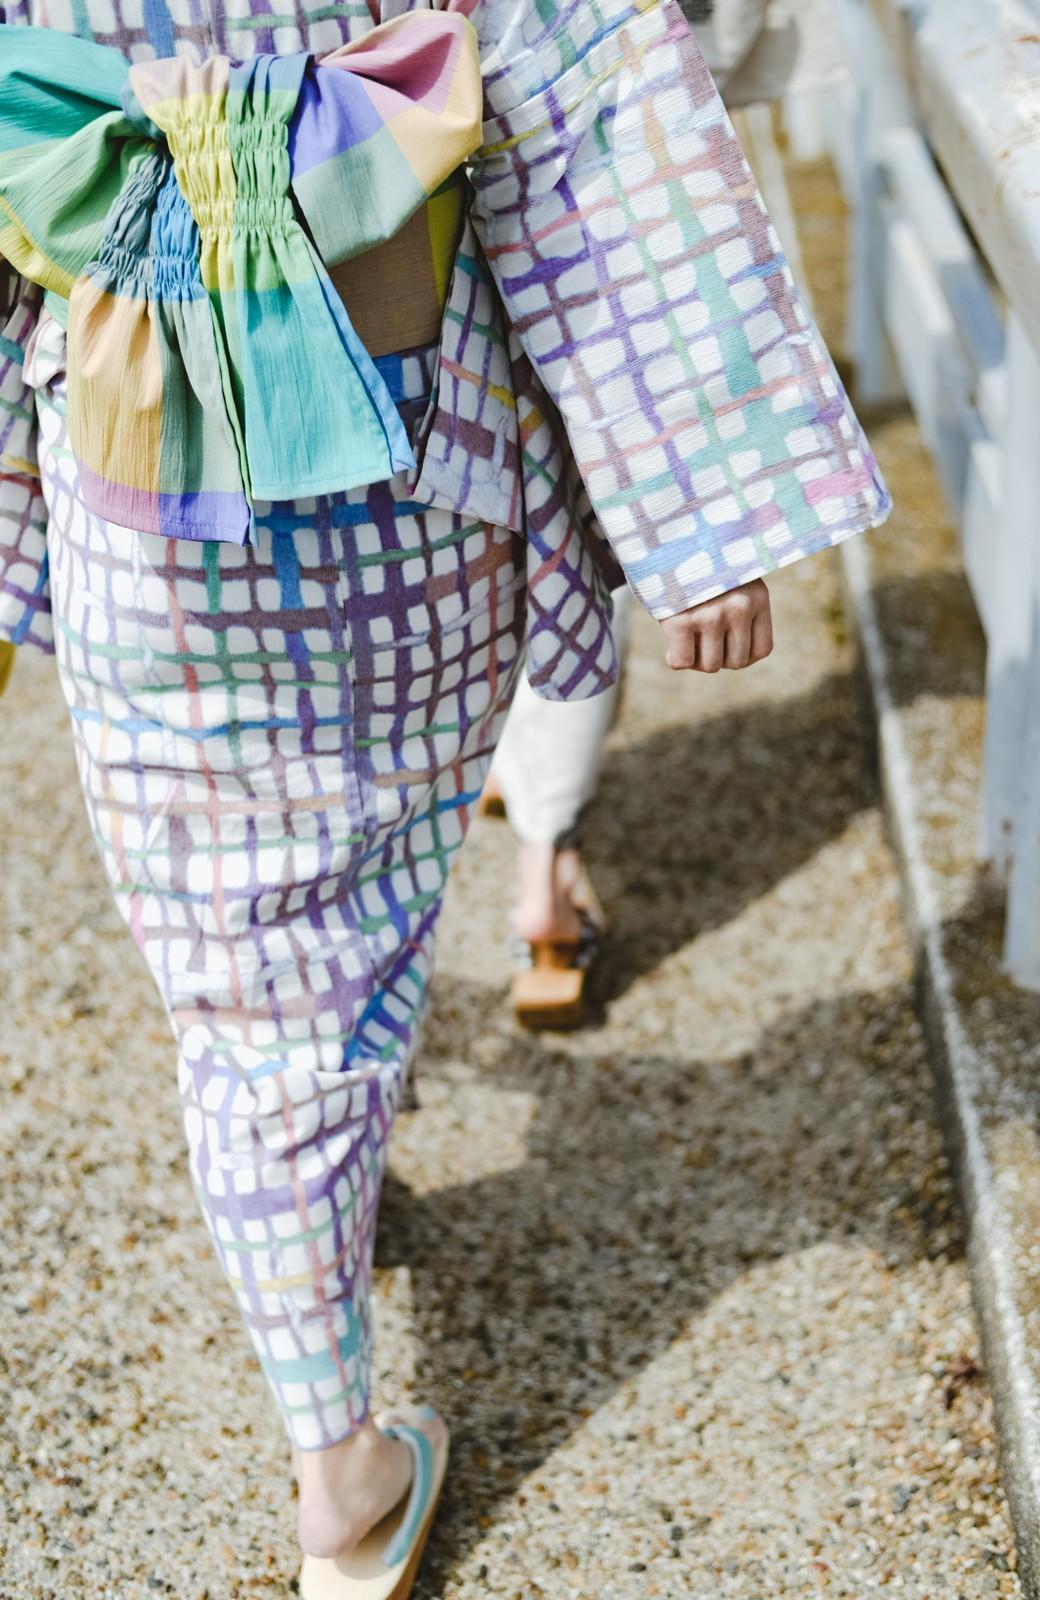 haco! ひでや工房 京都のへこ帯 大格子 <カラフル>の商品写真4